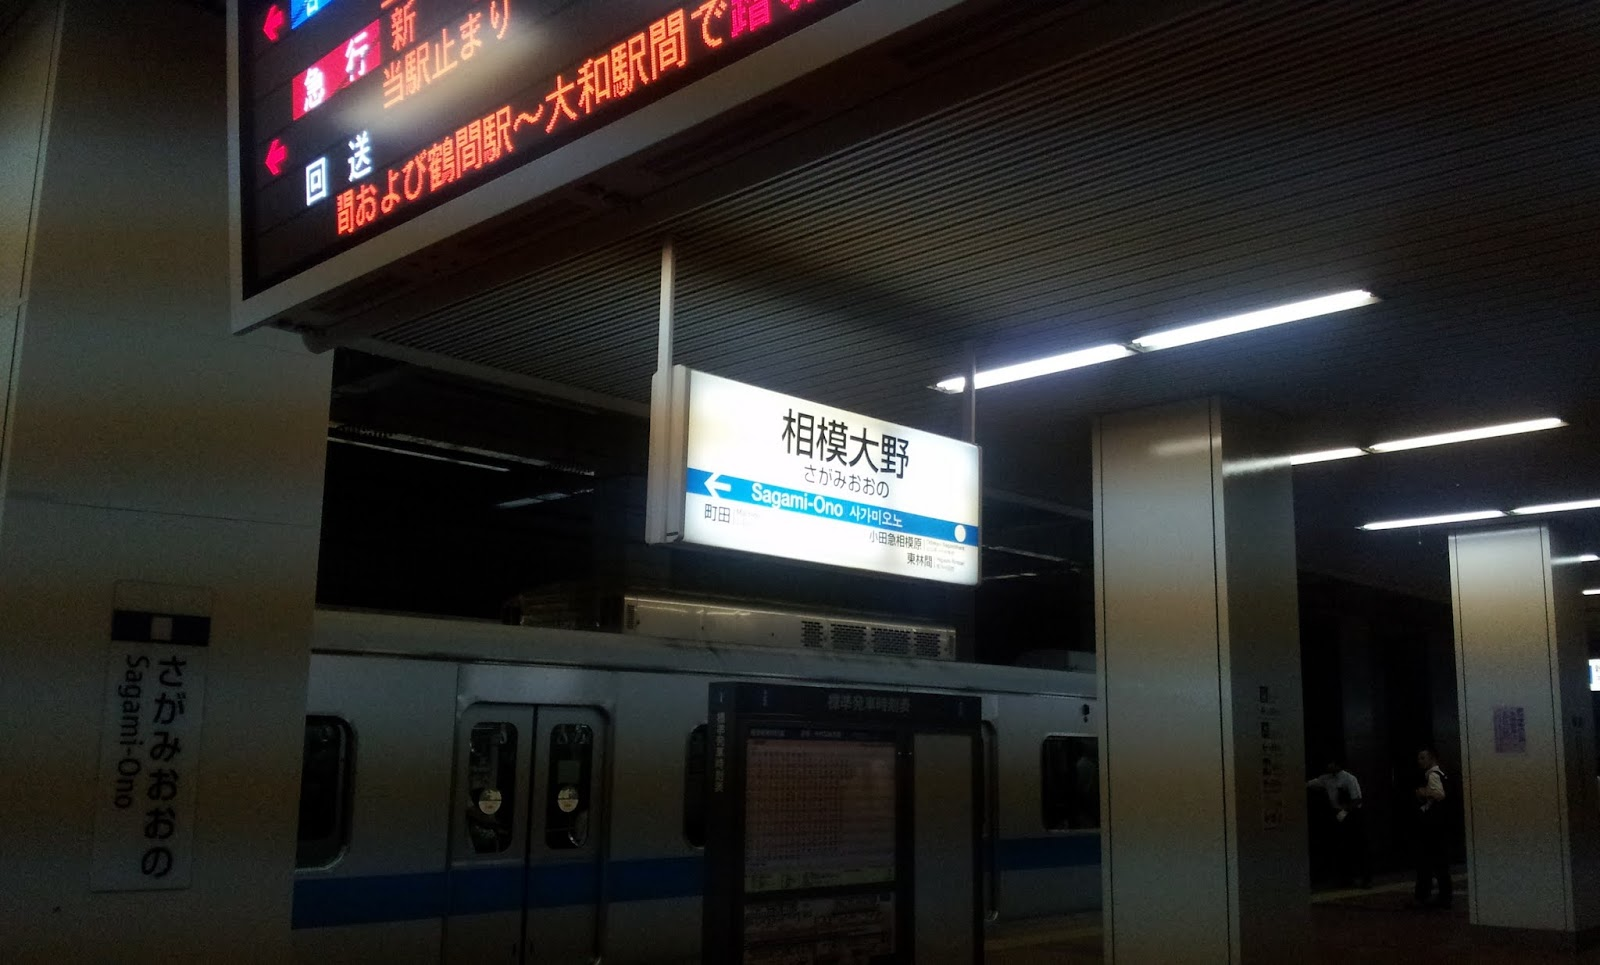 sagami-oono-station 相模大野駅看板